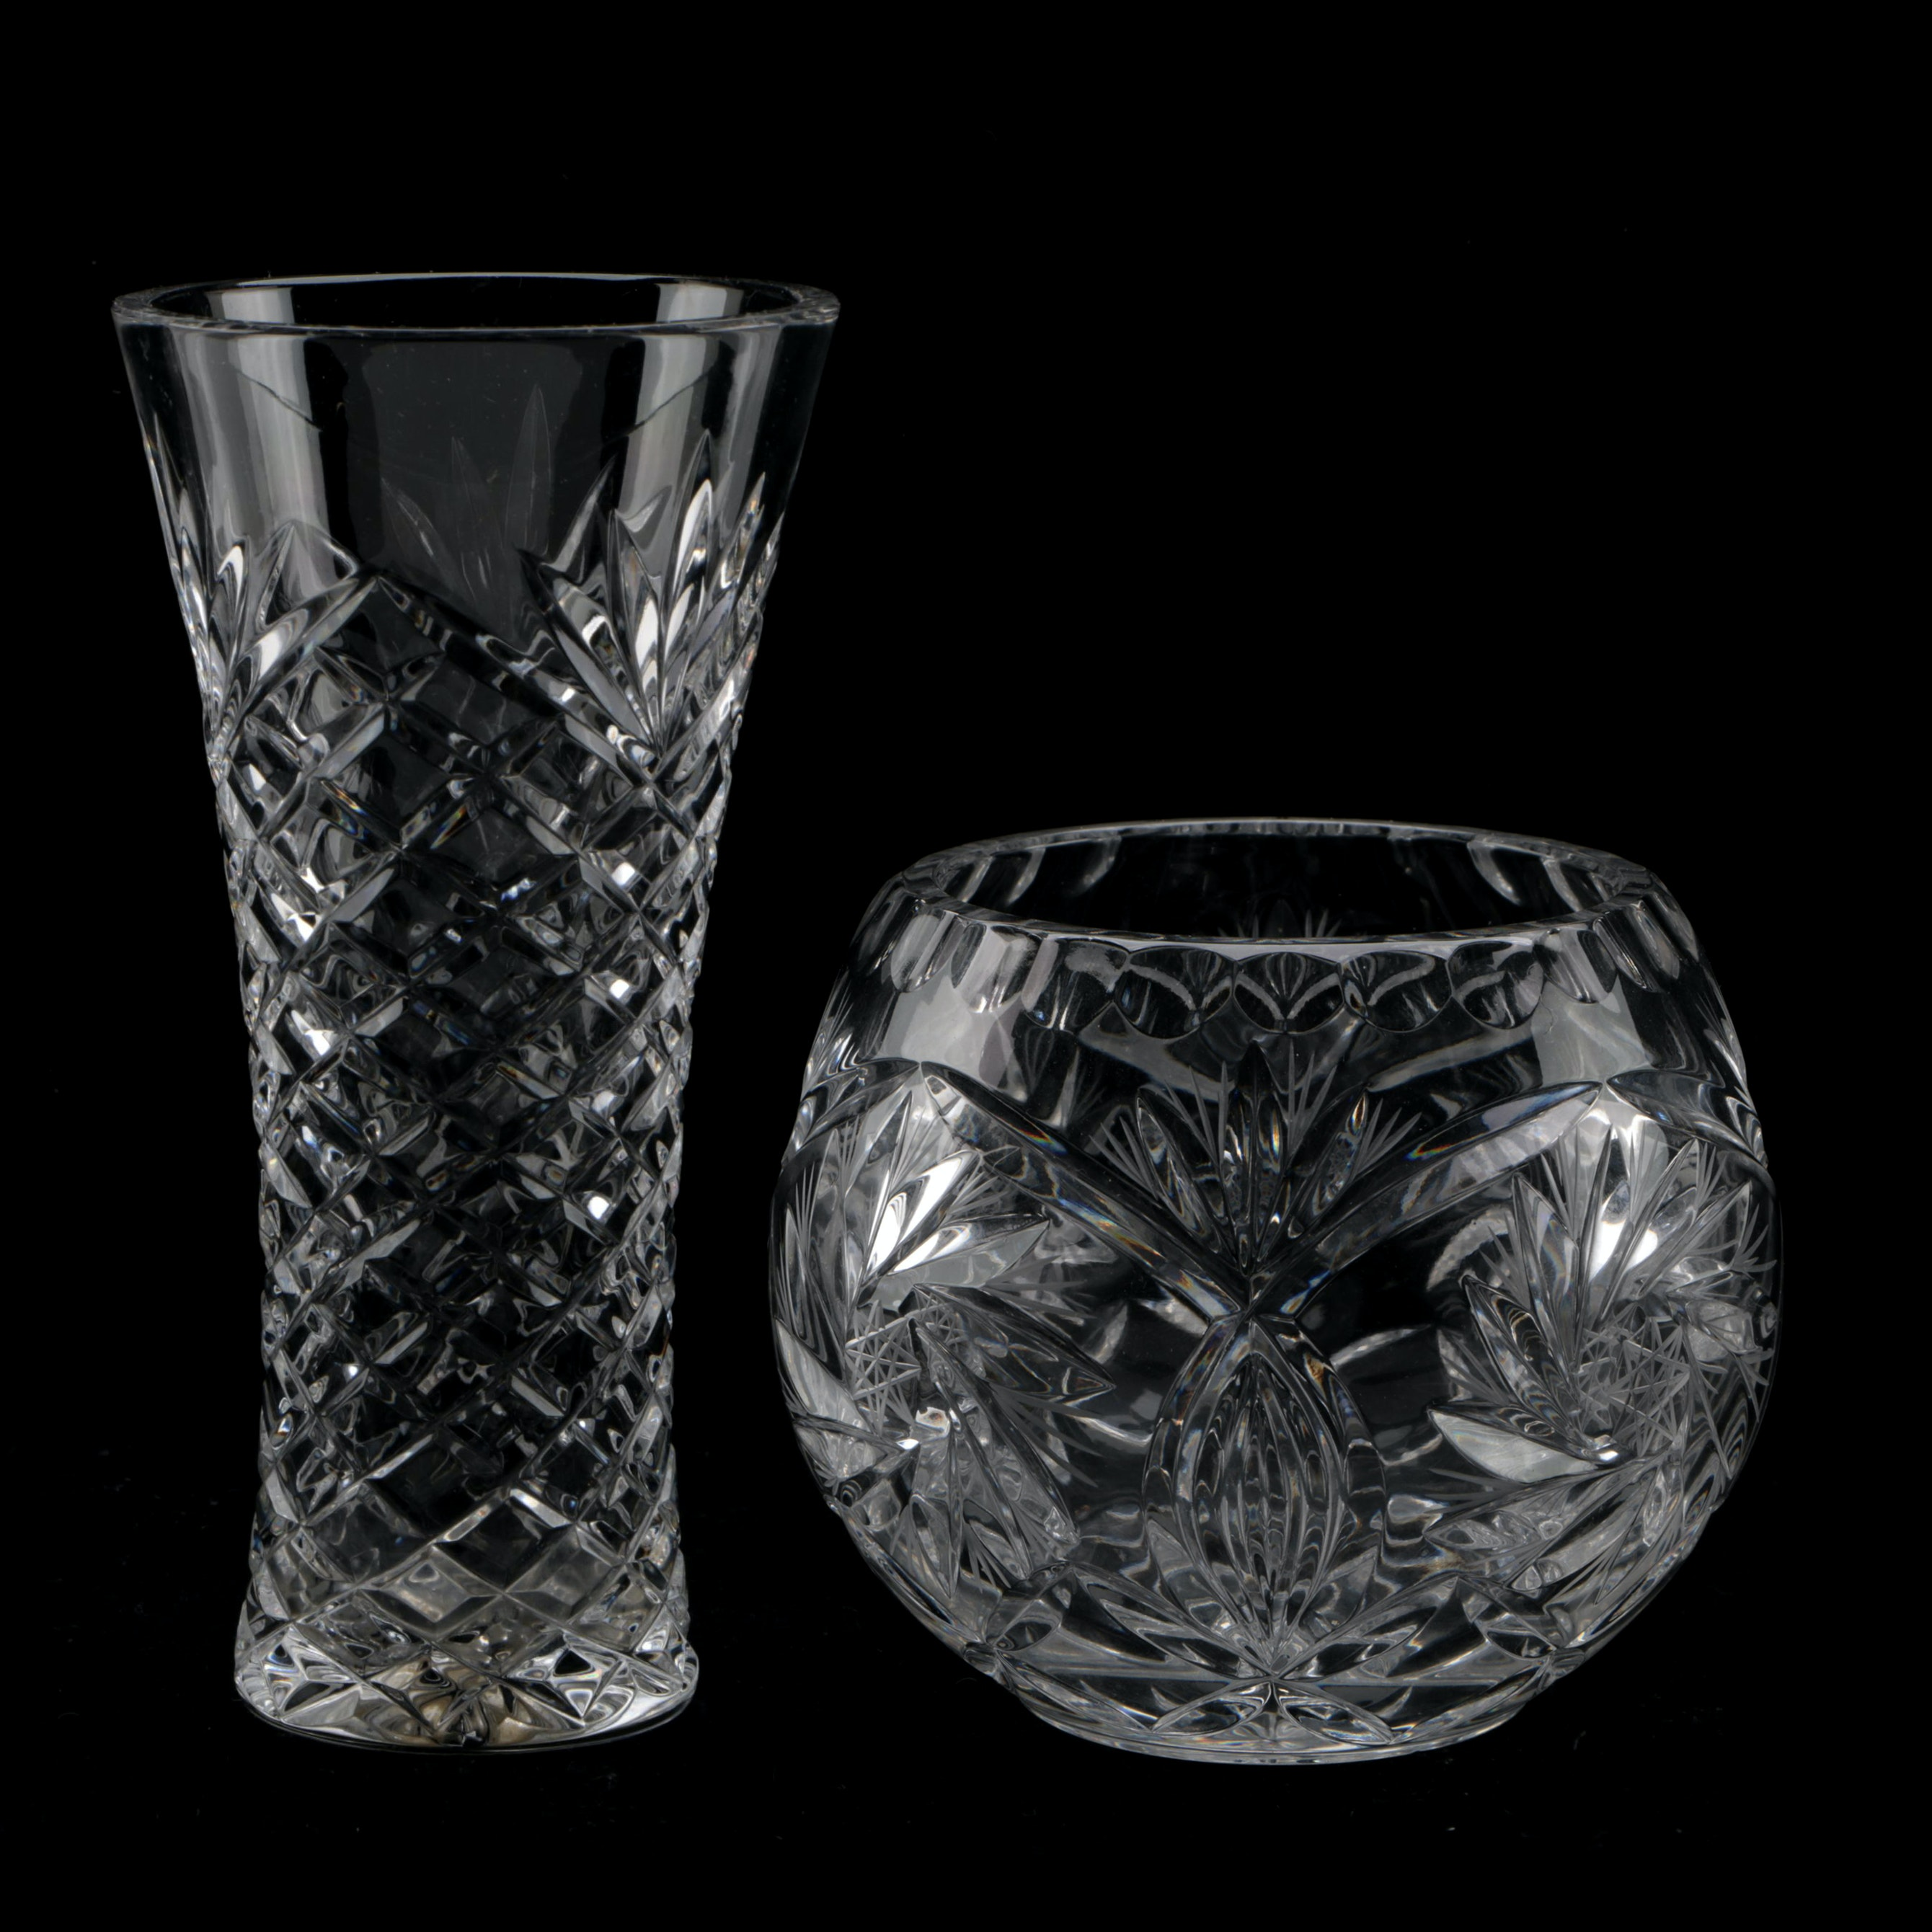 Crystal Vase and Rose Bowl